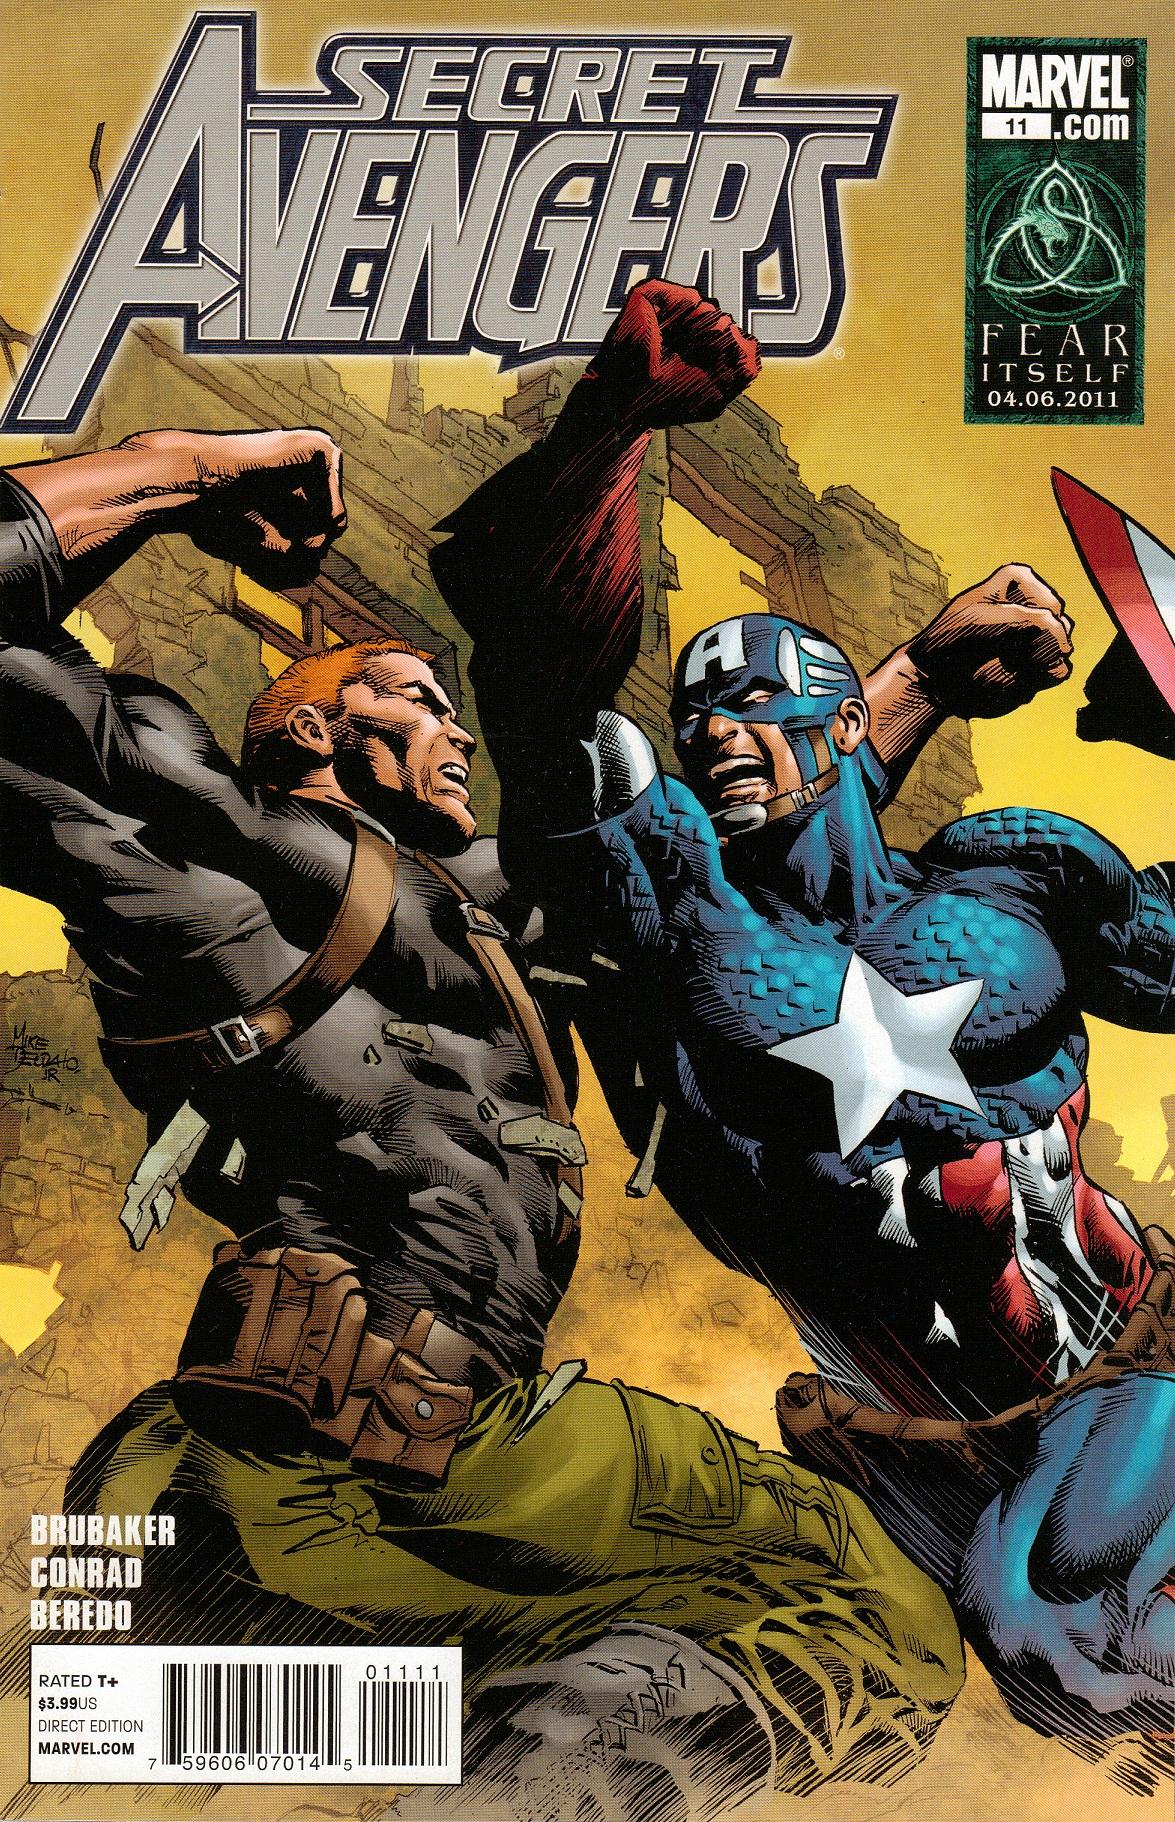 Secret Avengers Vol 1 11